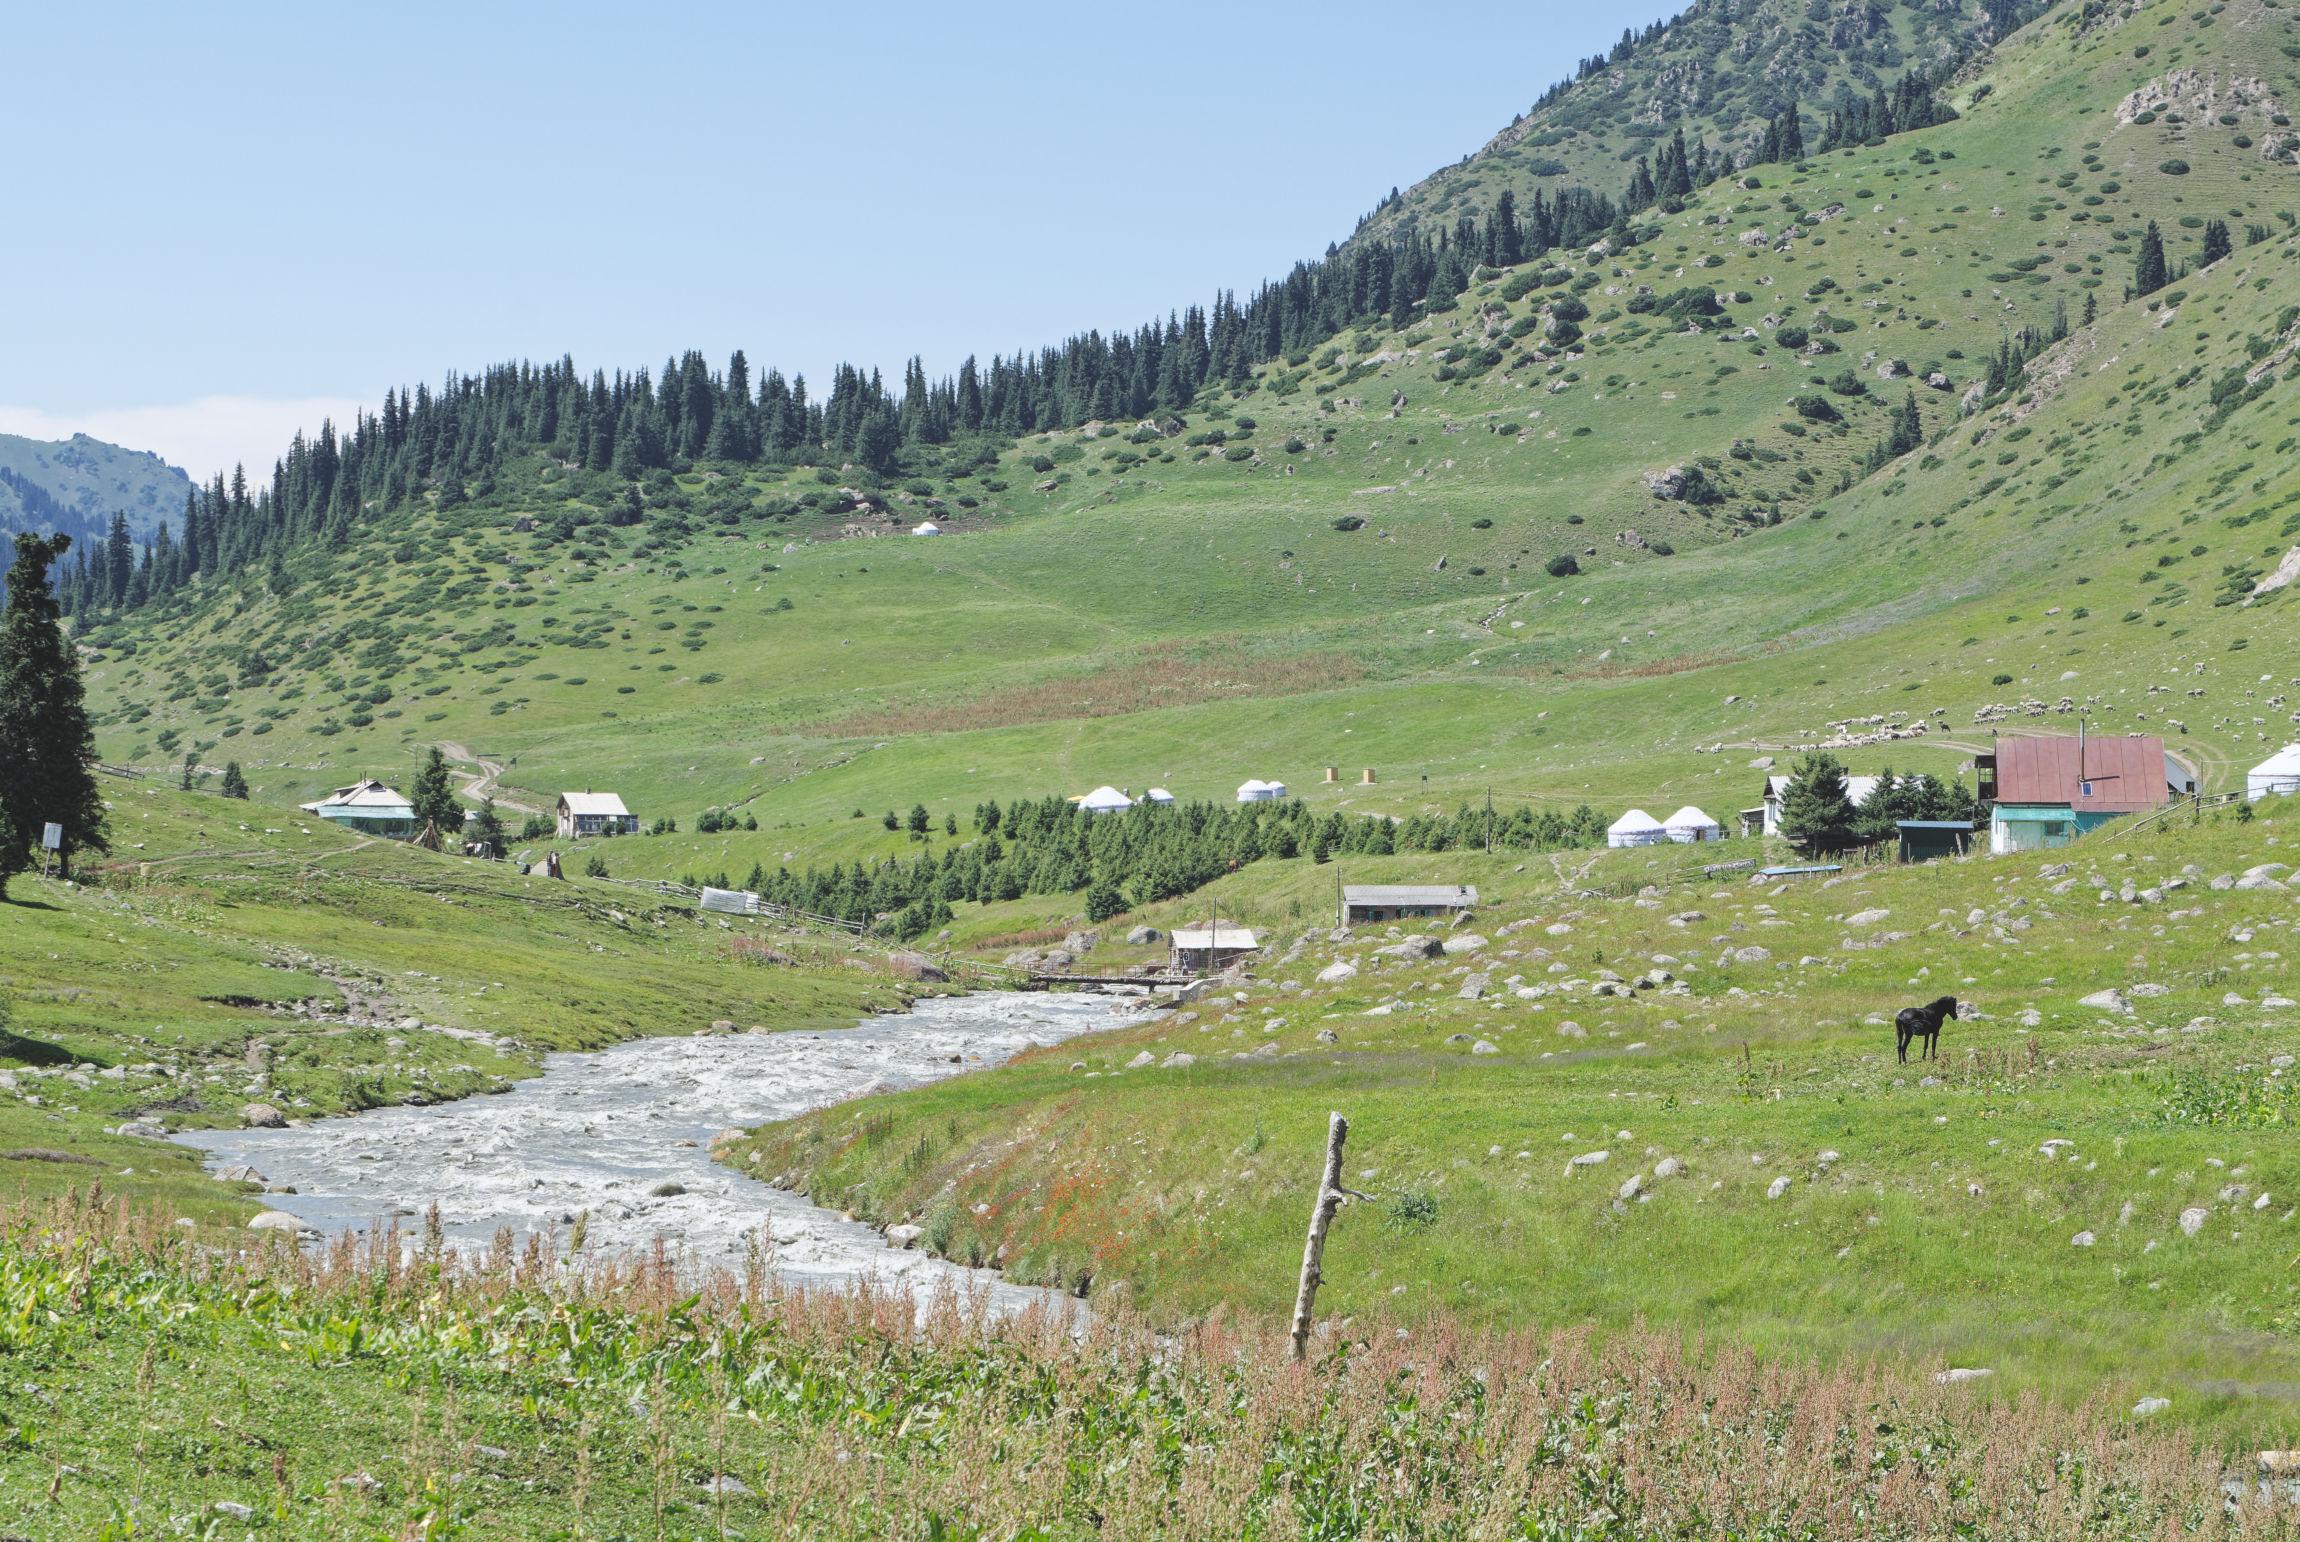 Altyn Arashan Kirghizstan, cheval et maisons